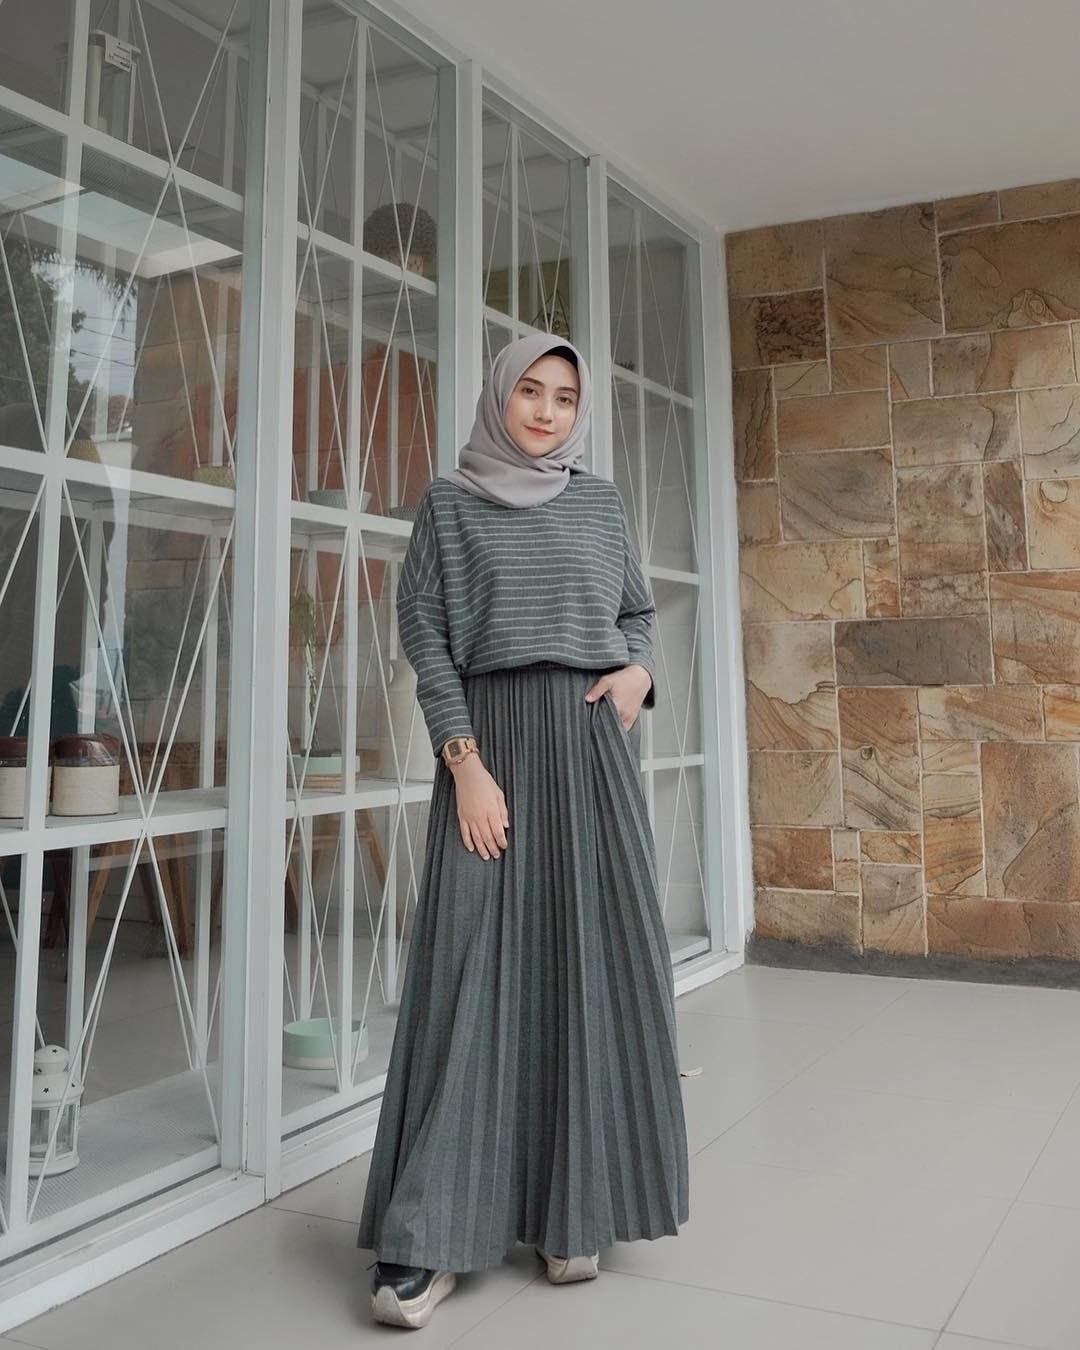 Ide Gambar Model Baju Lebaran 2019 Drdp Baju Muslim Lebaran Terbaru 2019 Dengan Gambar